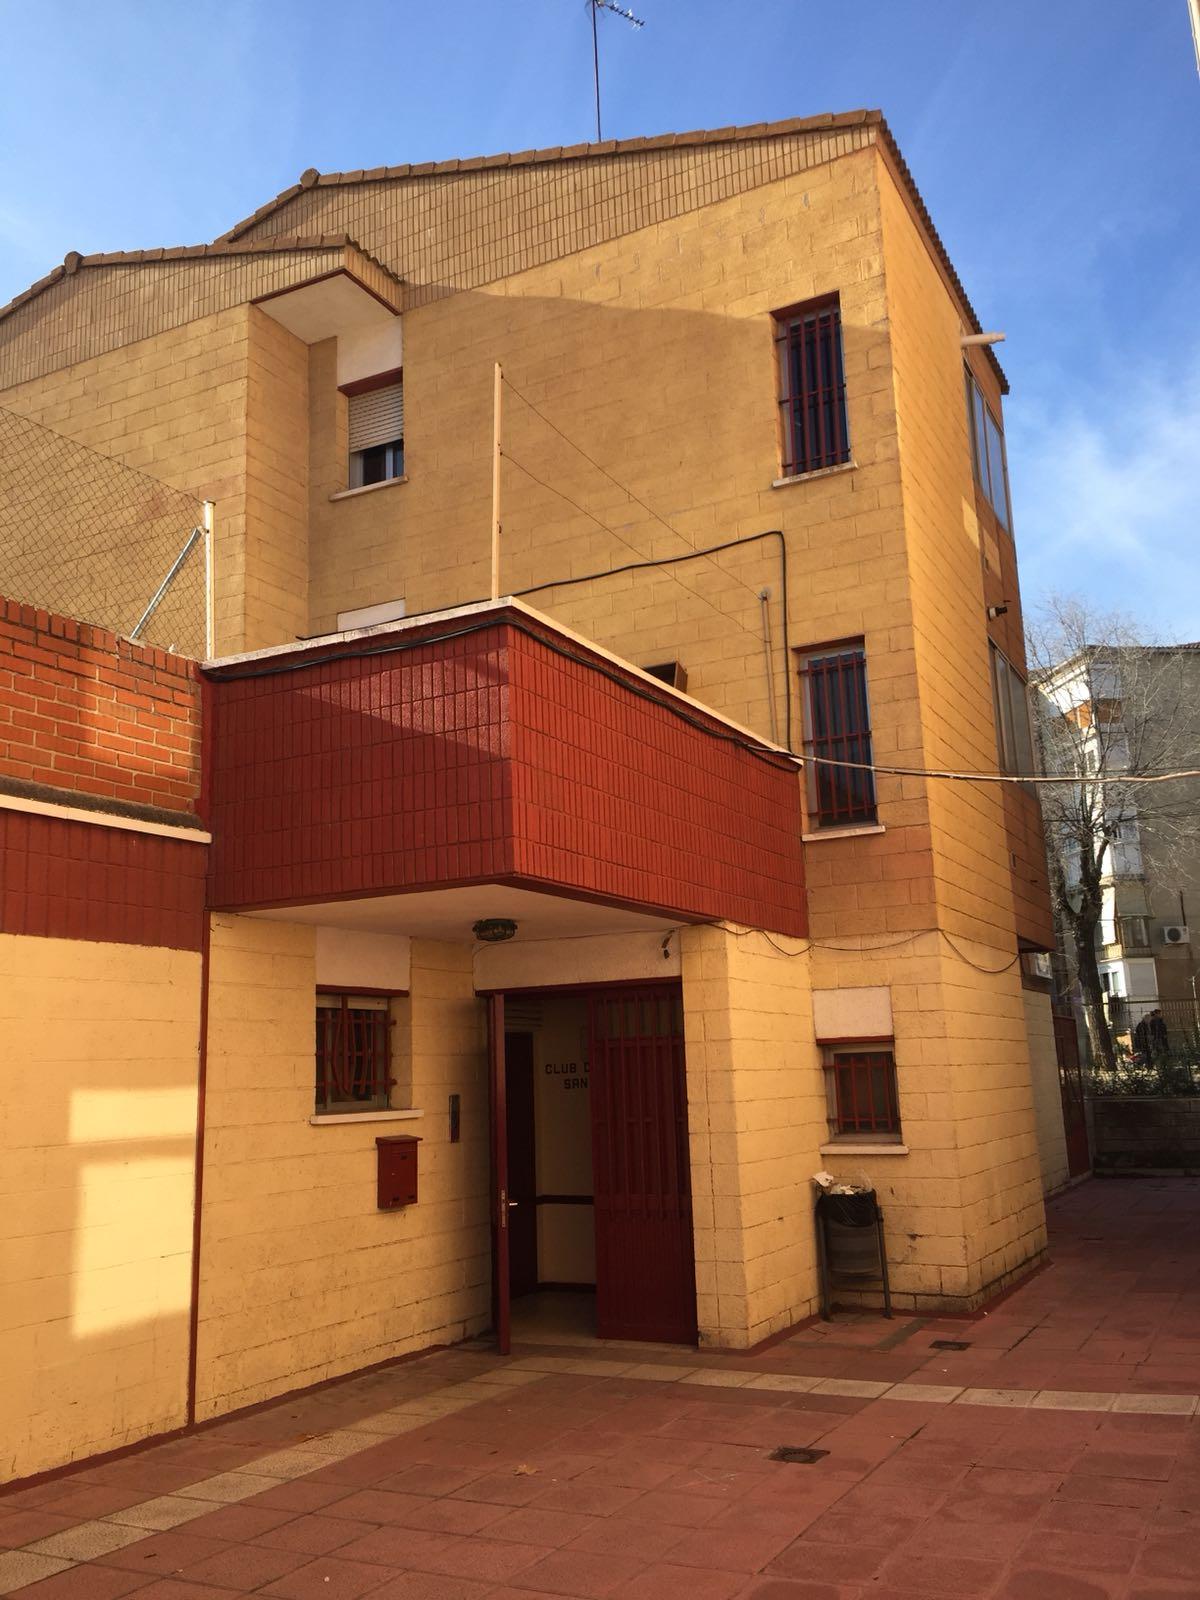 Casa Hogar Juan Vaccari 2c Barrio San Blas Madrid